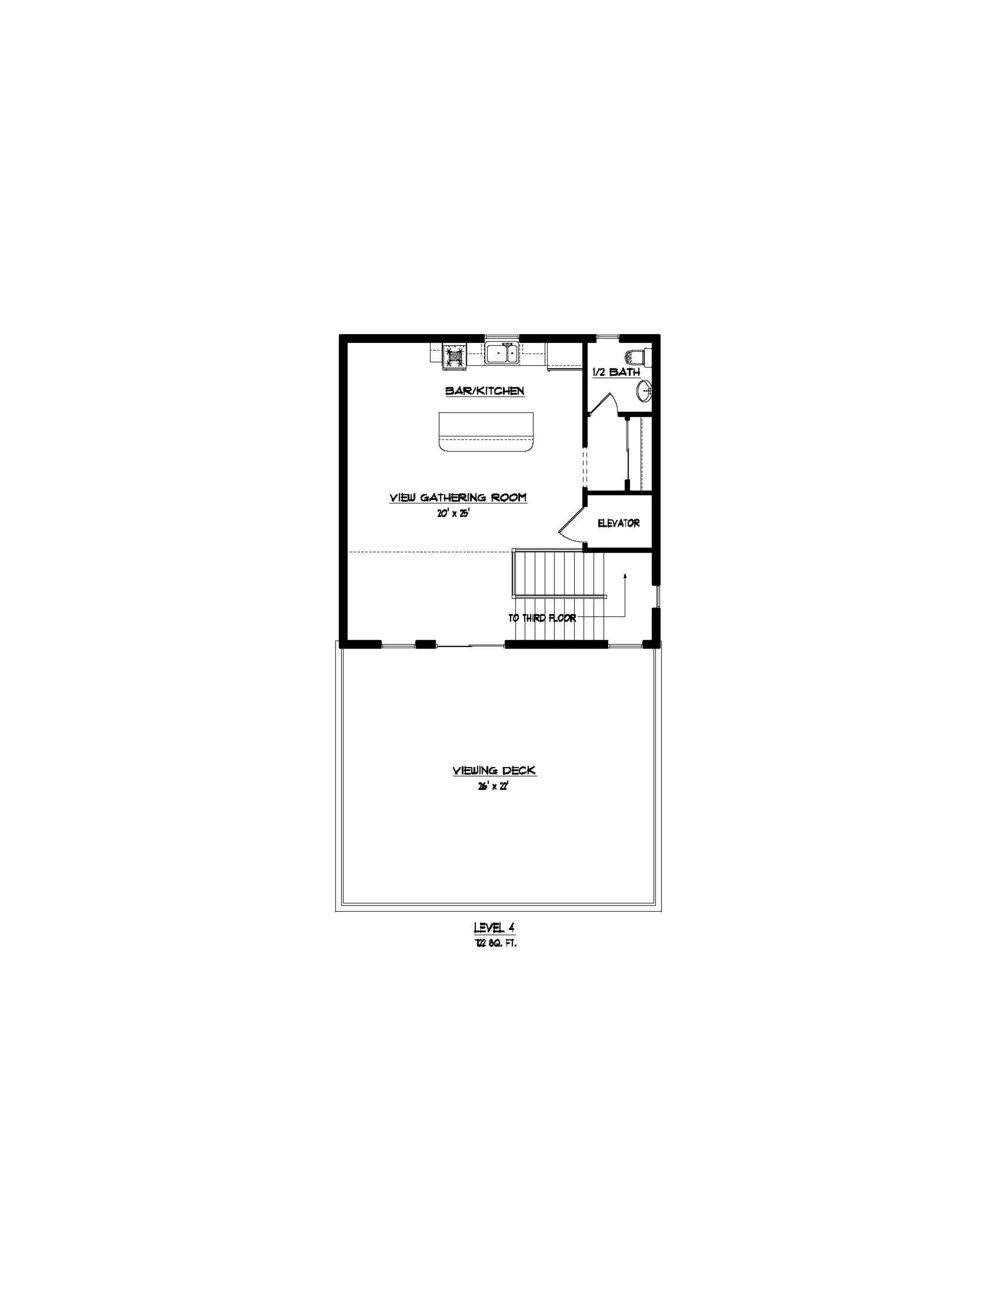 Dayton floor level 4.jpg